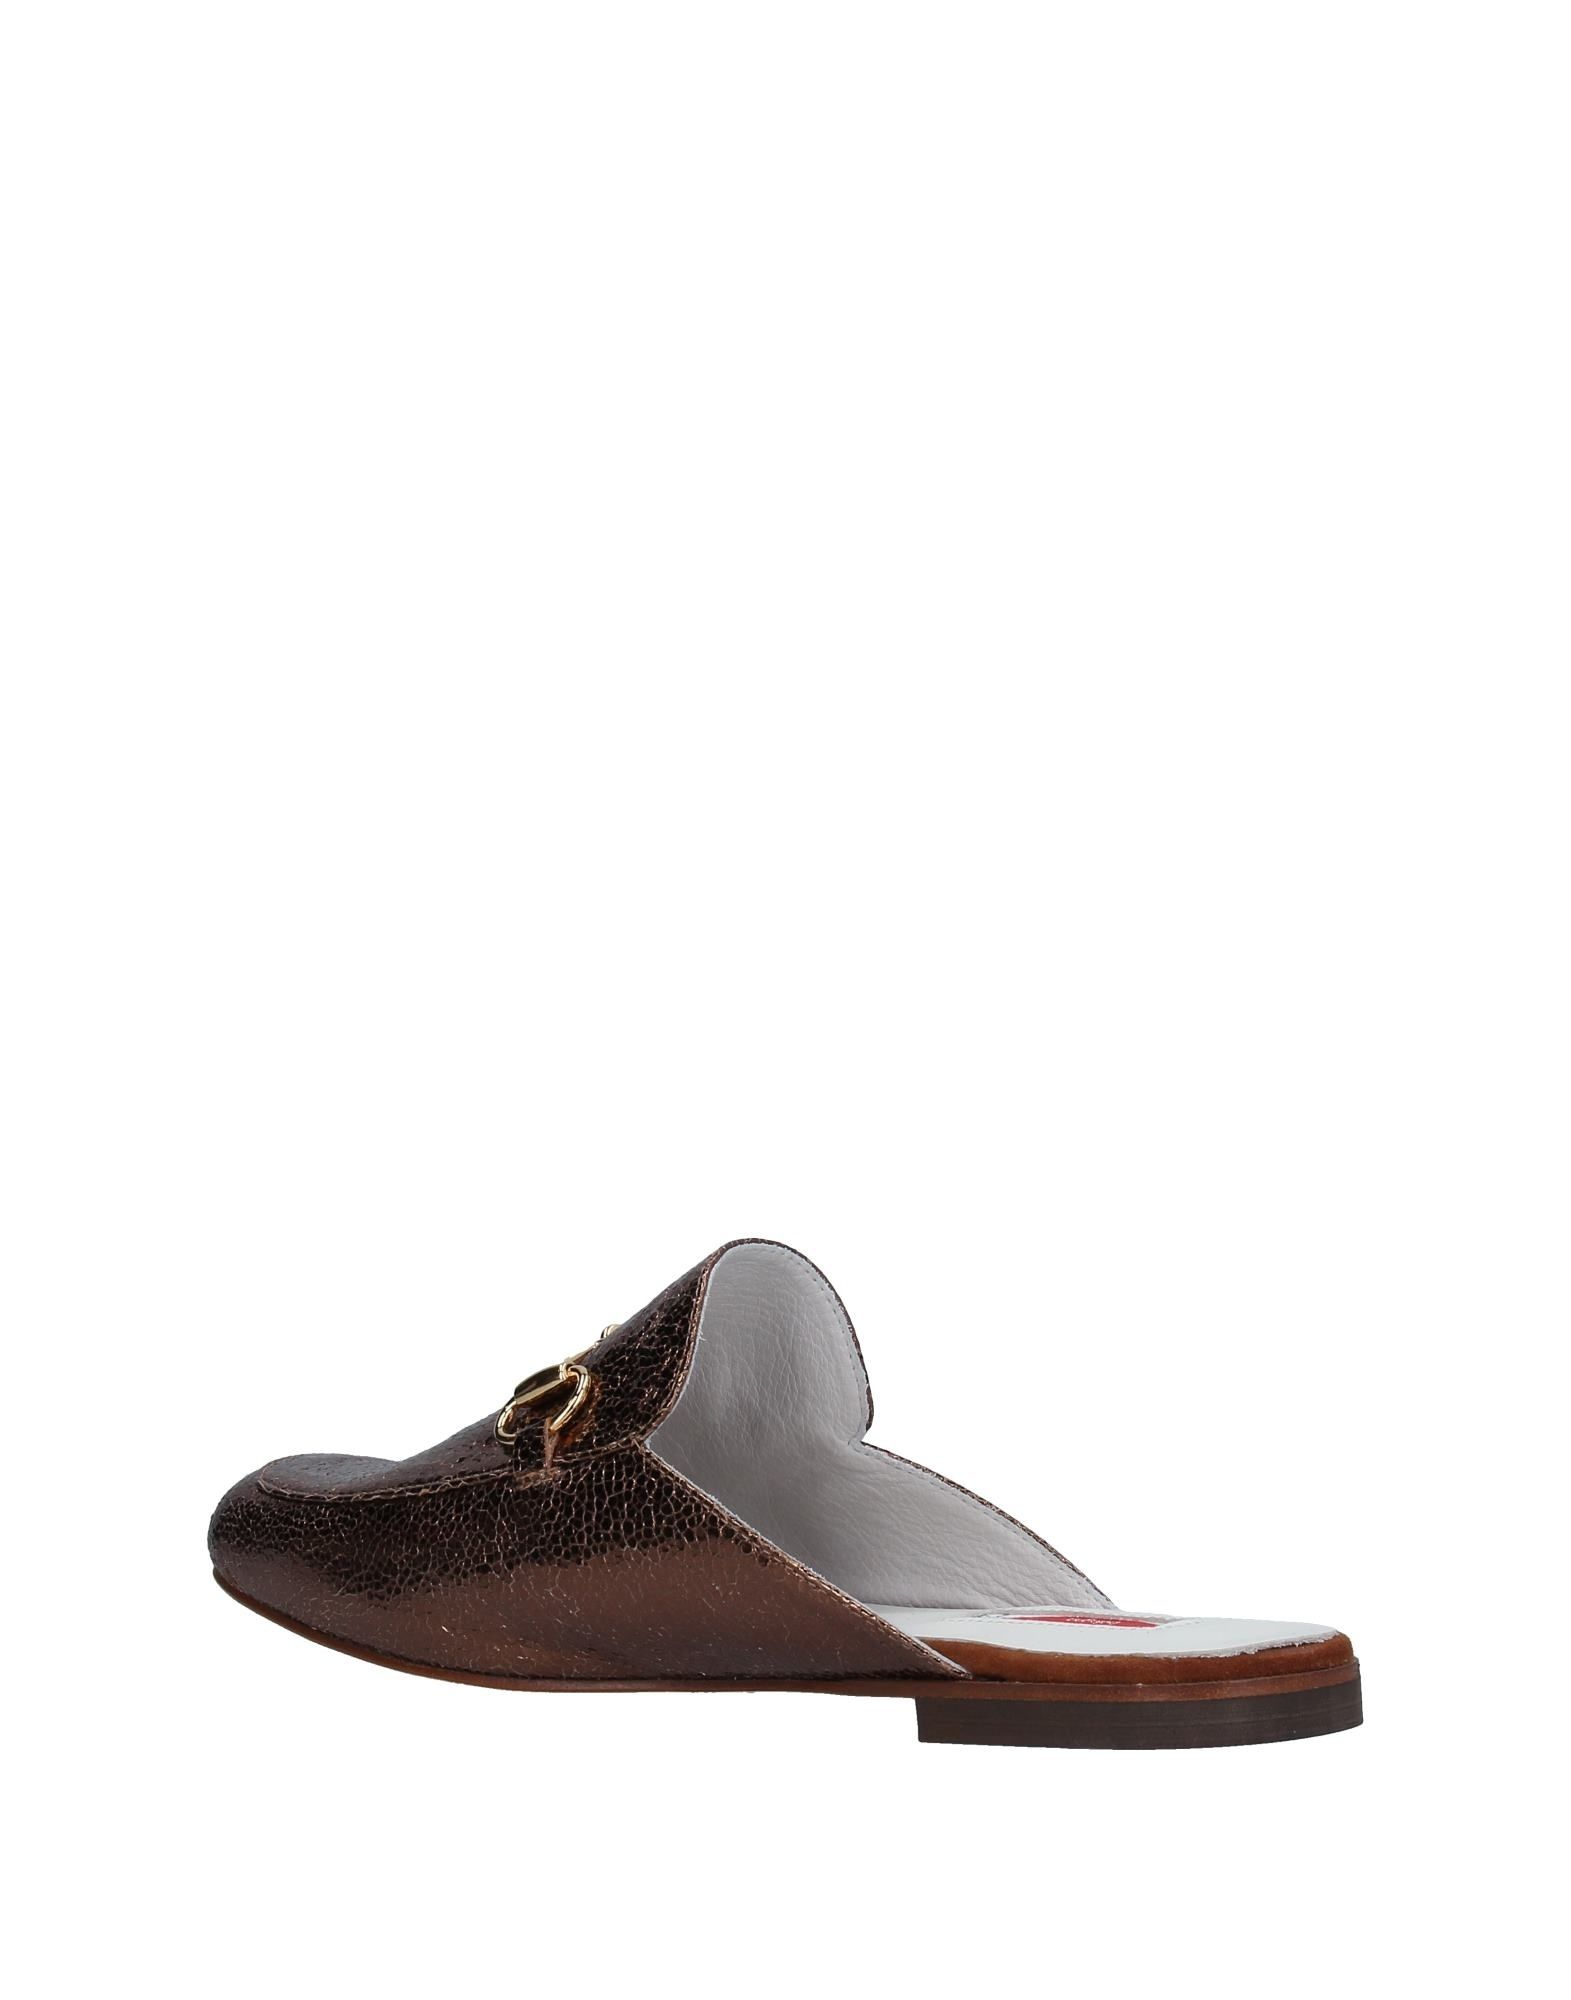 Spaziomoda Pantoletten Damen  11341859EU Gute Qualität beliebte Schuhe